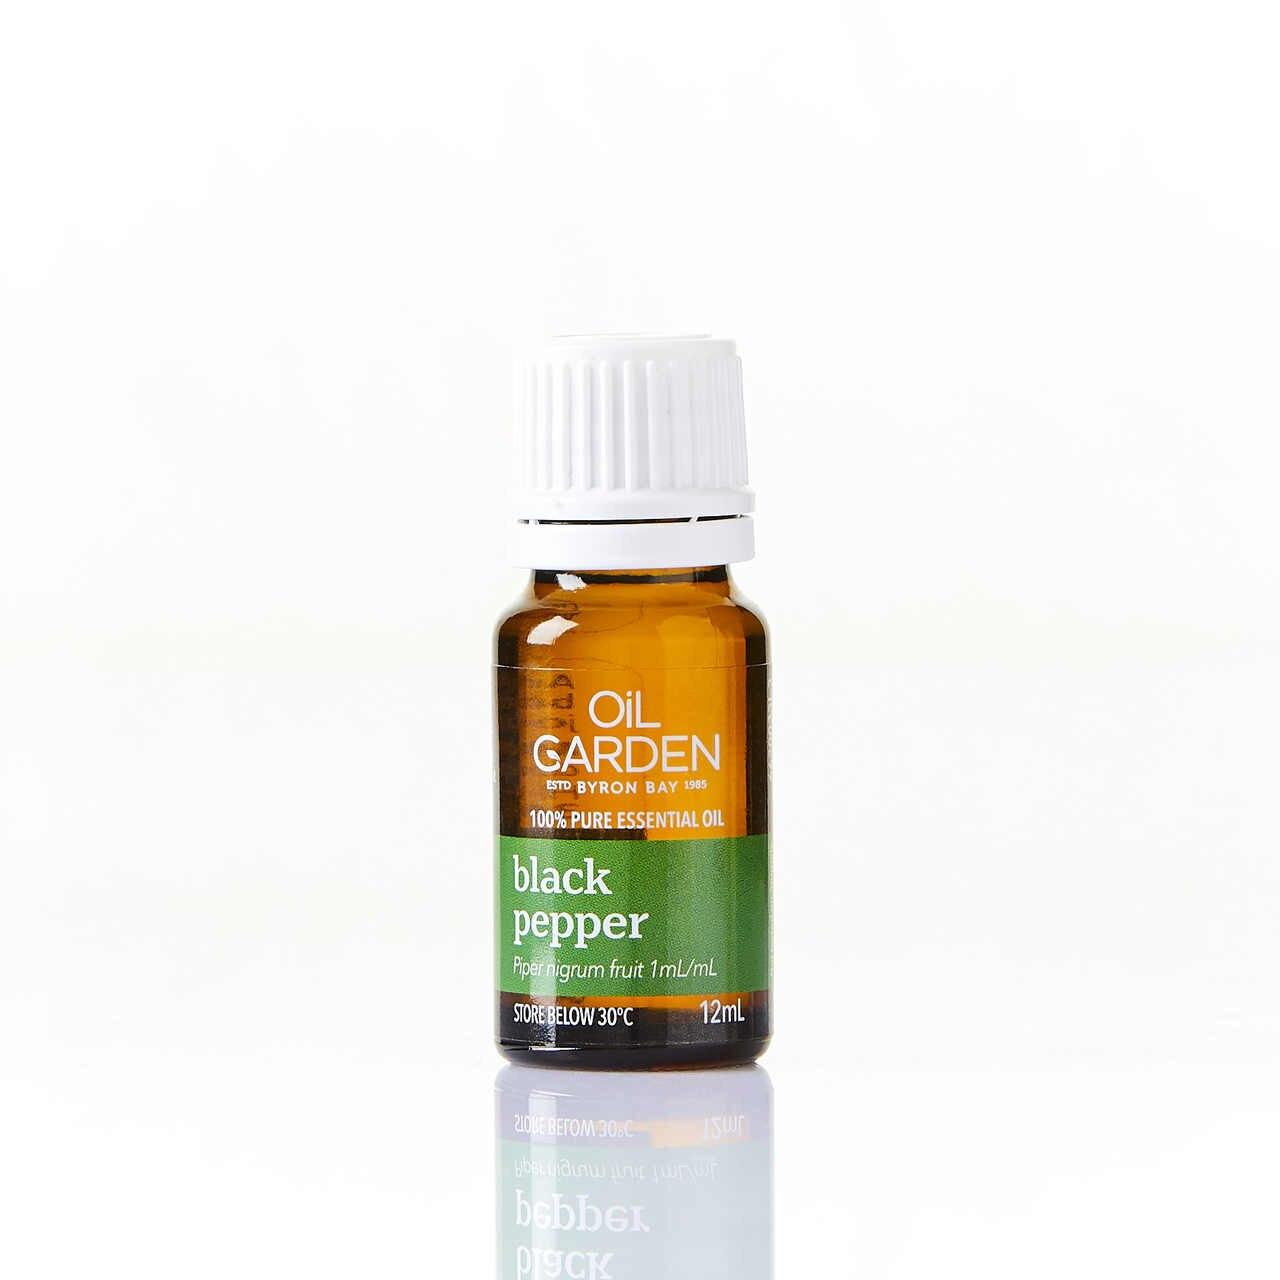 Oil Garden Black Pepper Pure Essential Oil 12mL 6620033